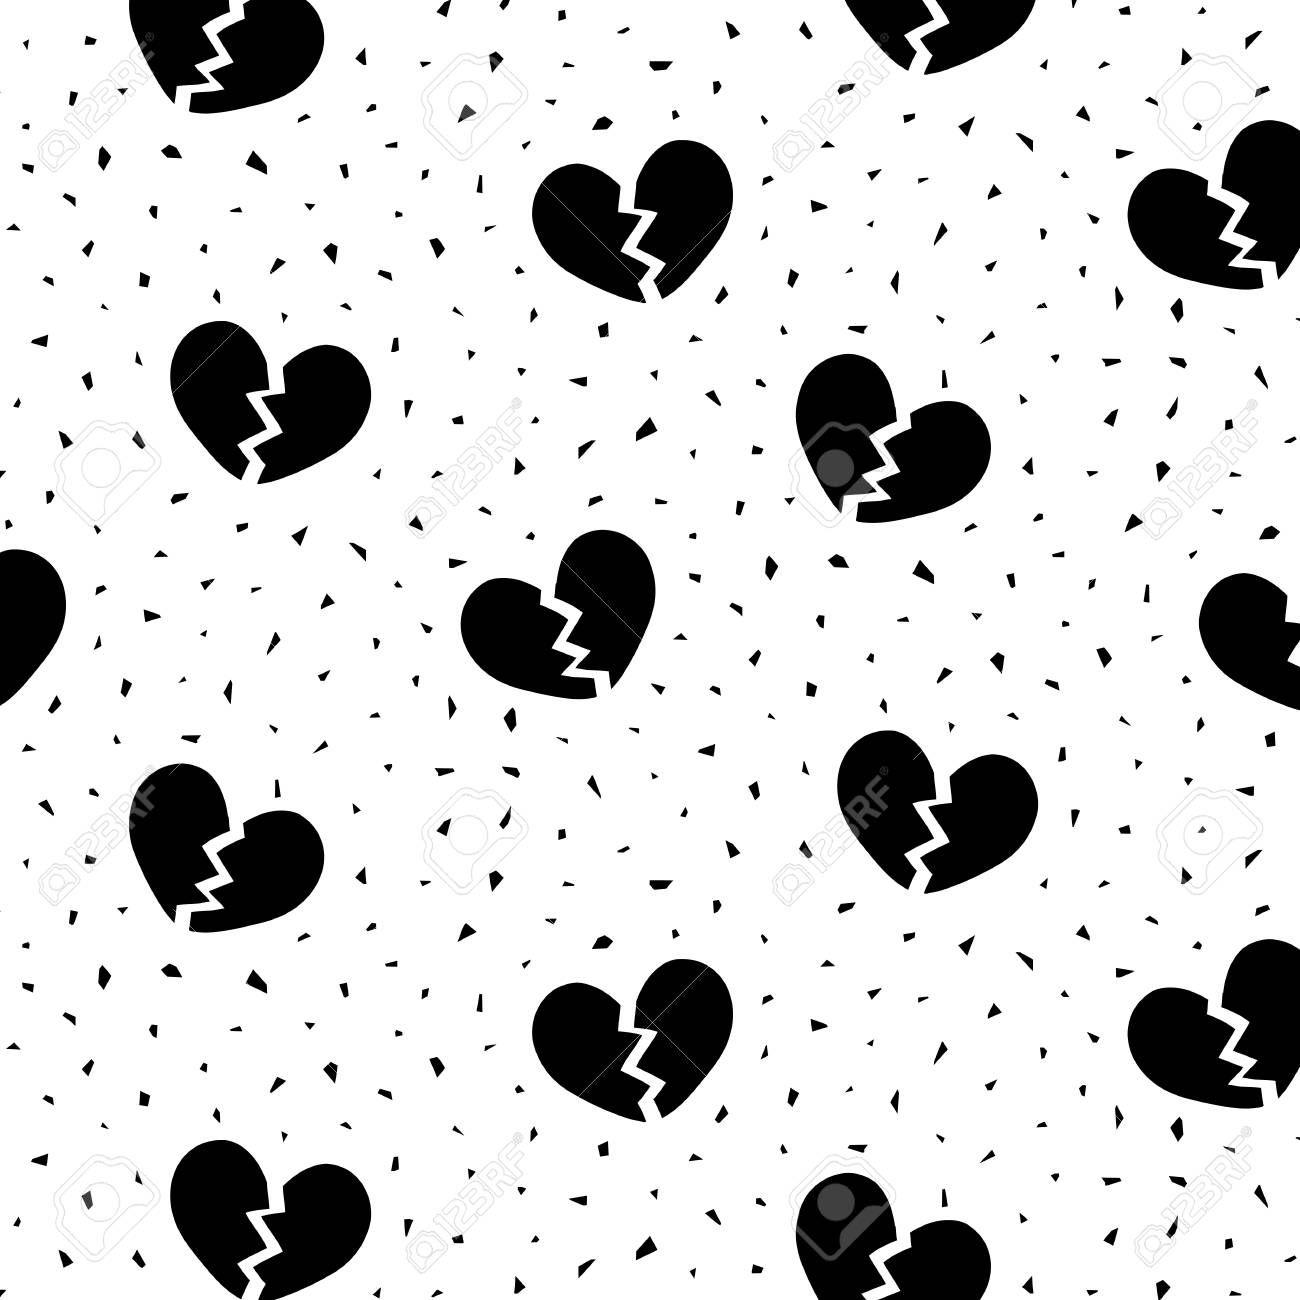 Image Result For Broken Heart Pattern